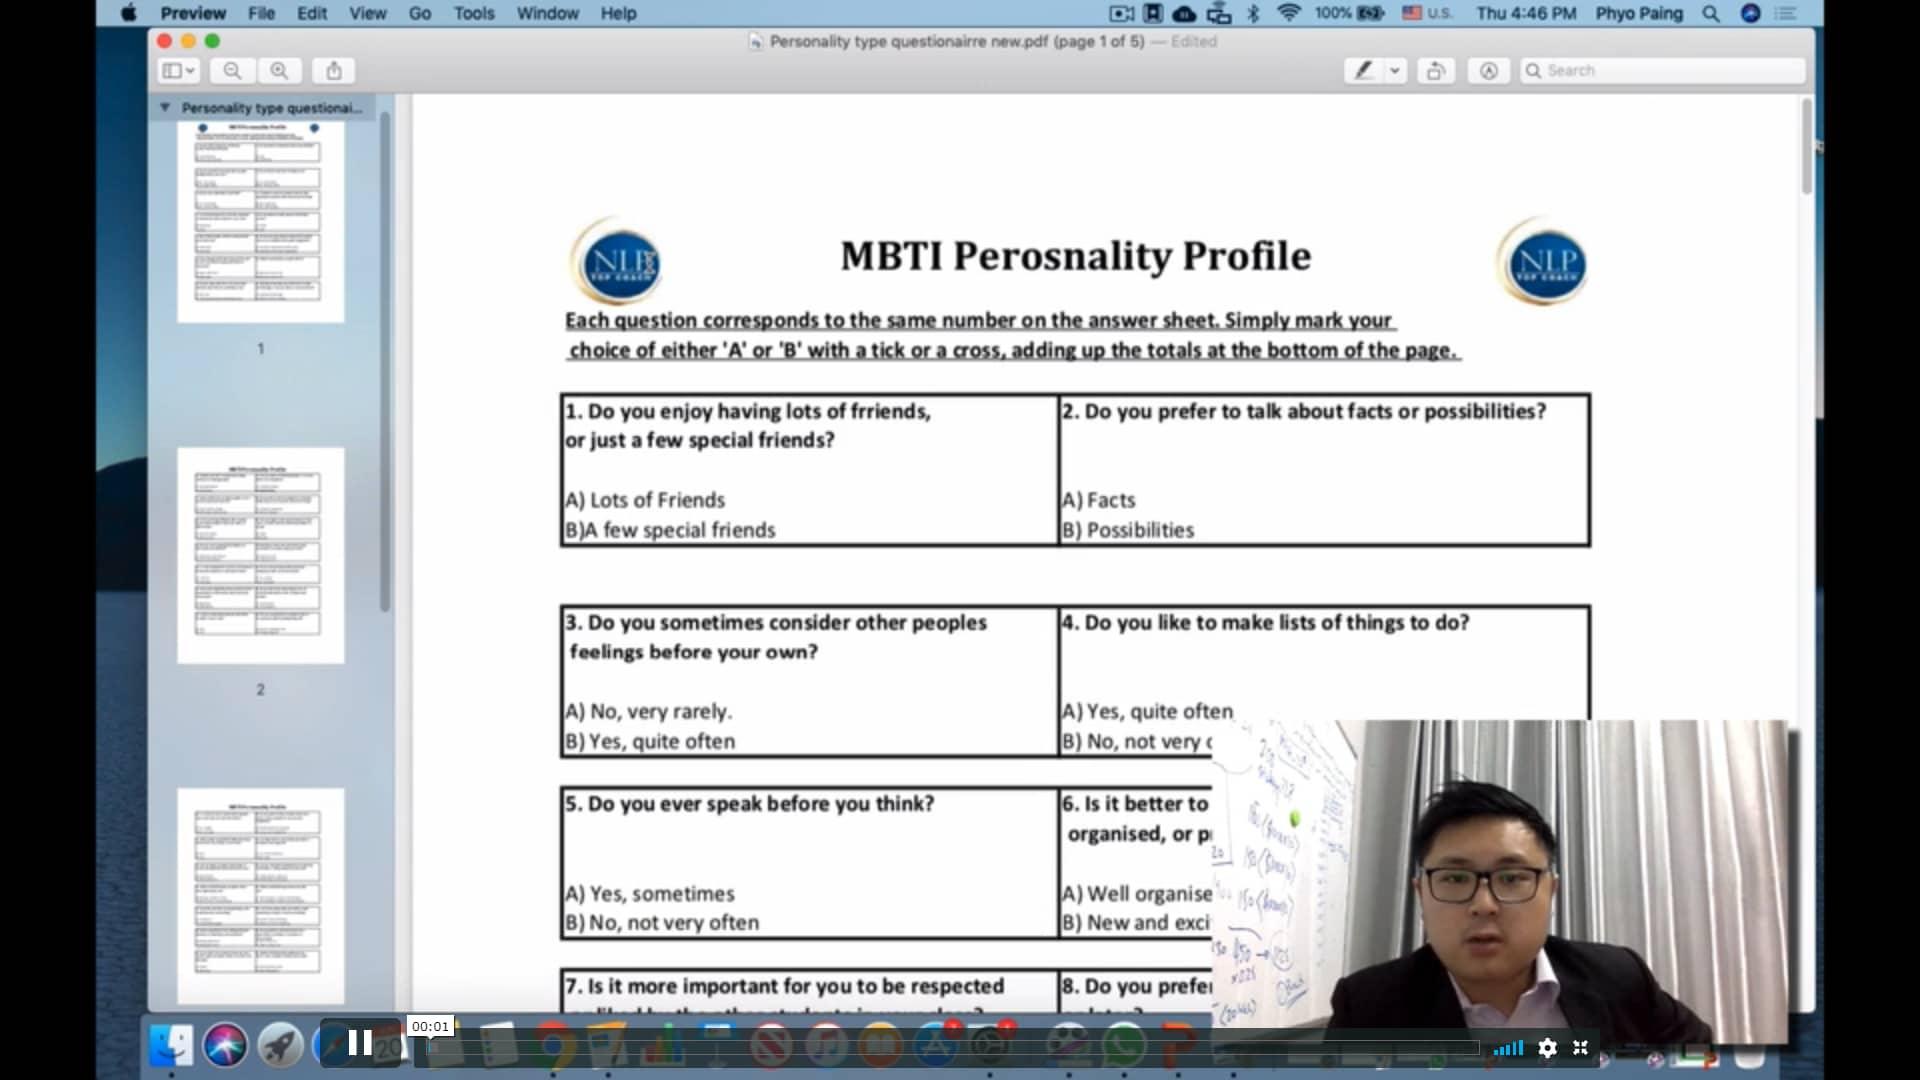 004 MBTI Personality Test 4